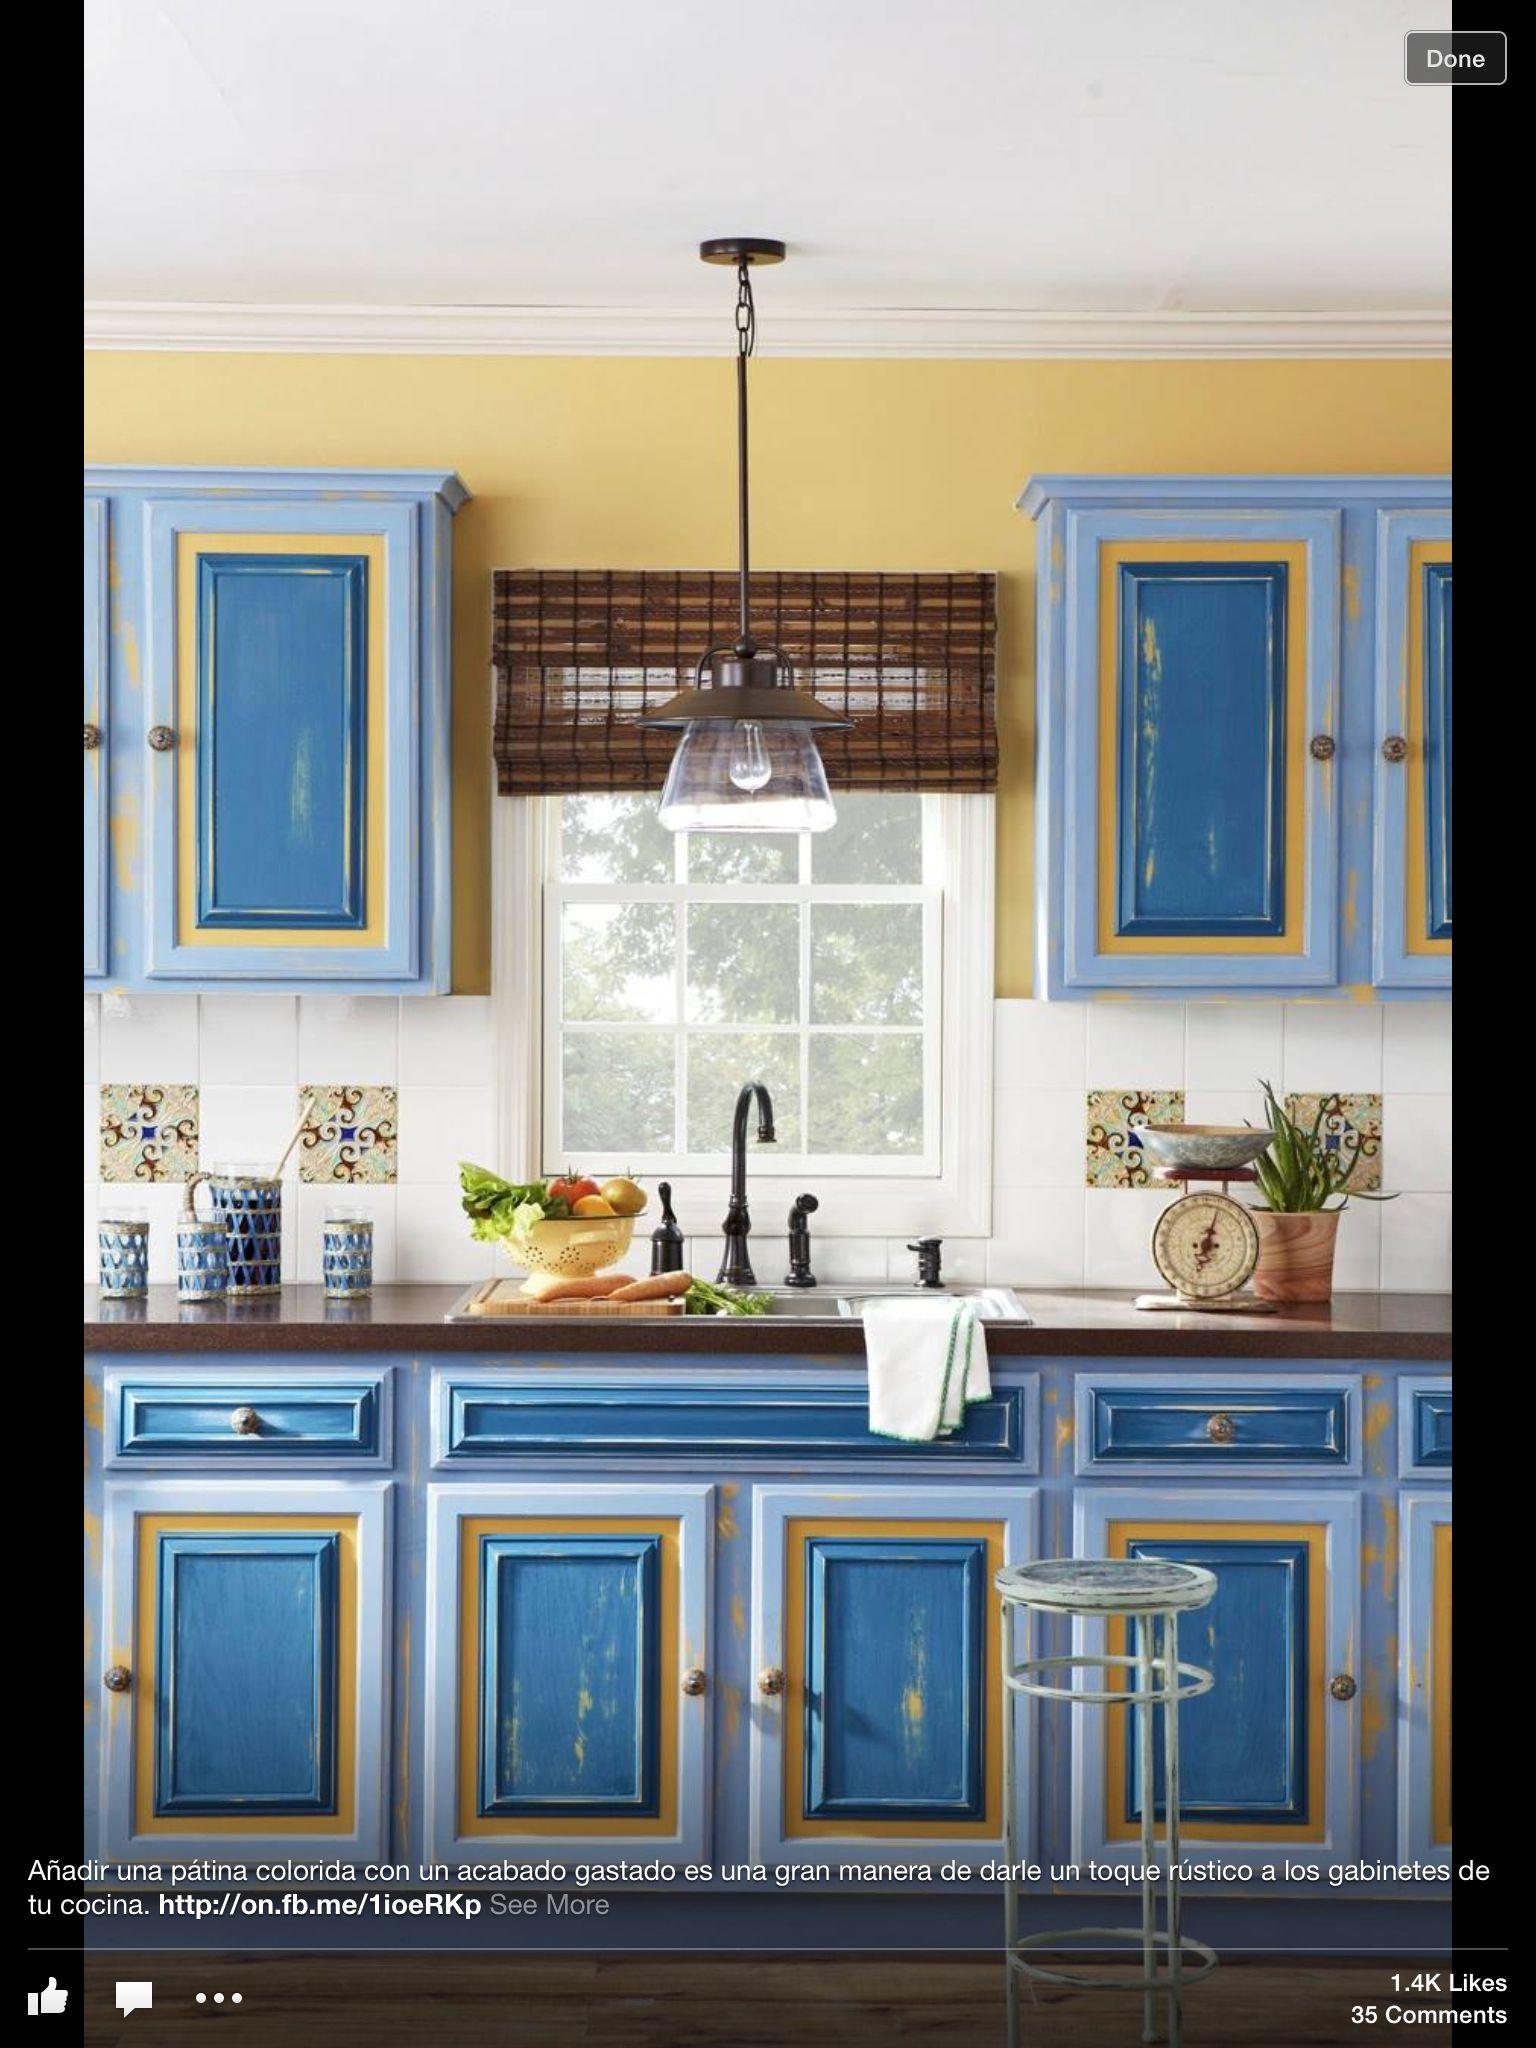 Different kitchen! Kitchen color combination